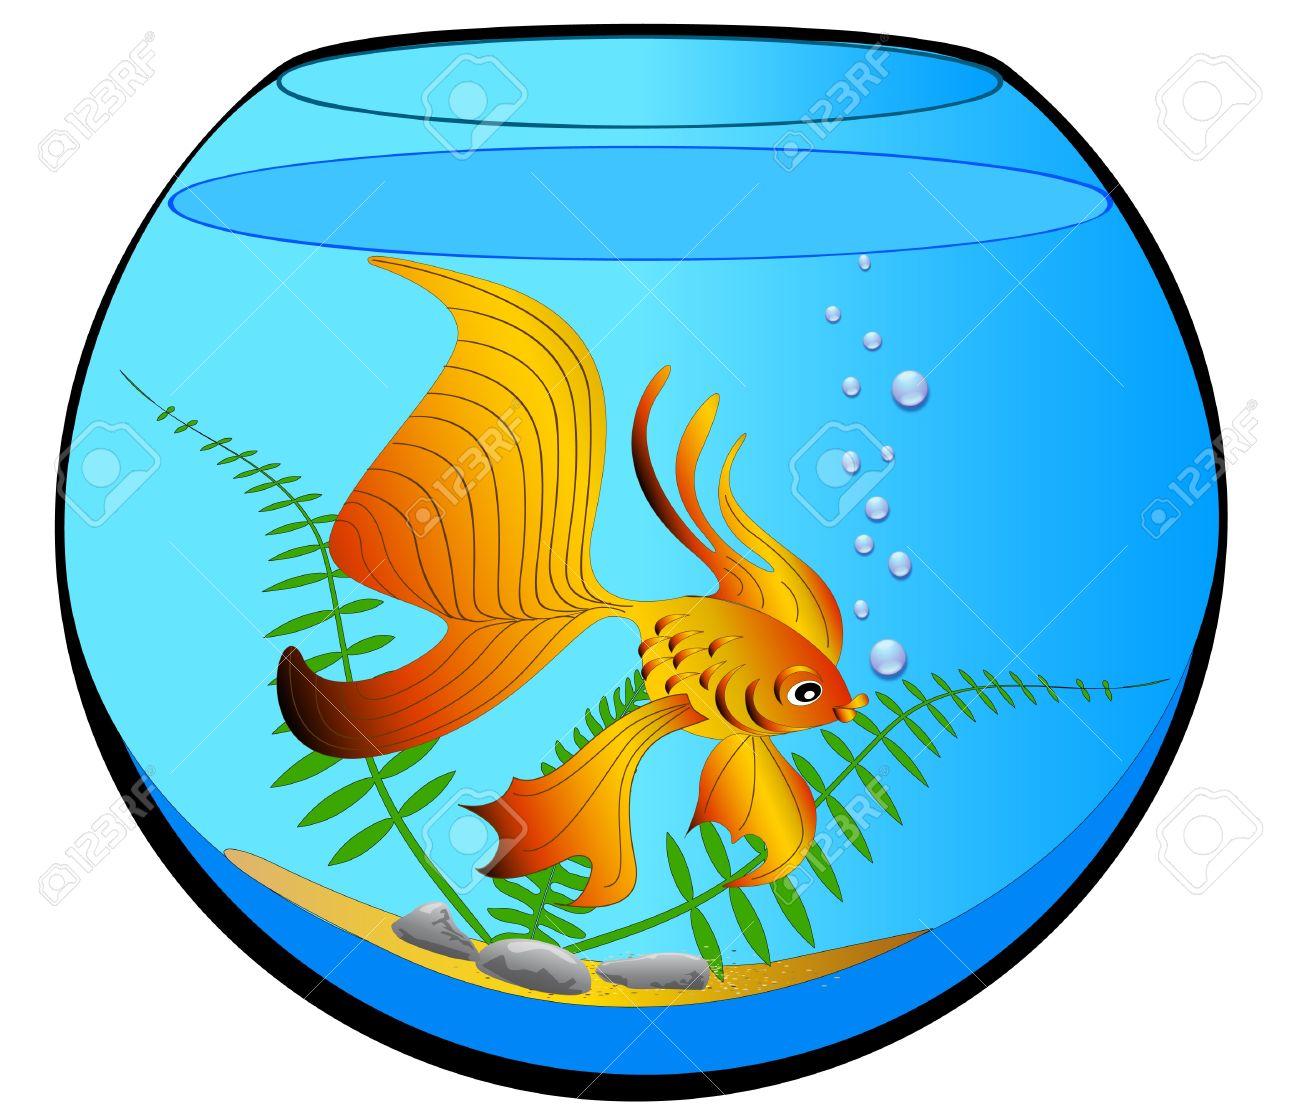 Fish Tank clipart #8, Download drawings